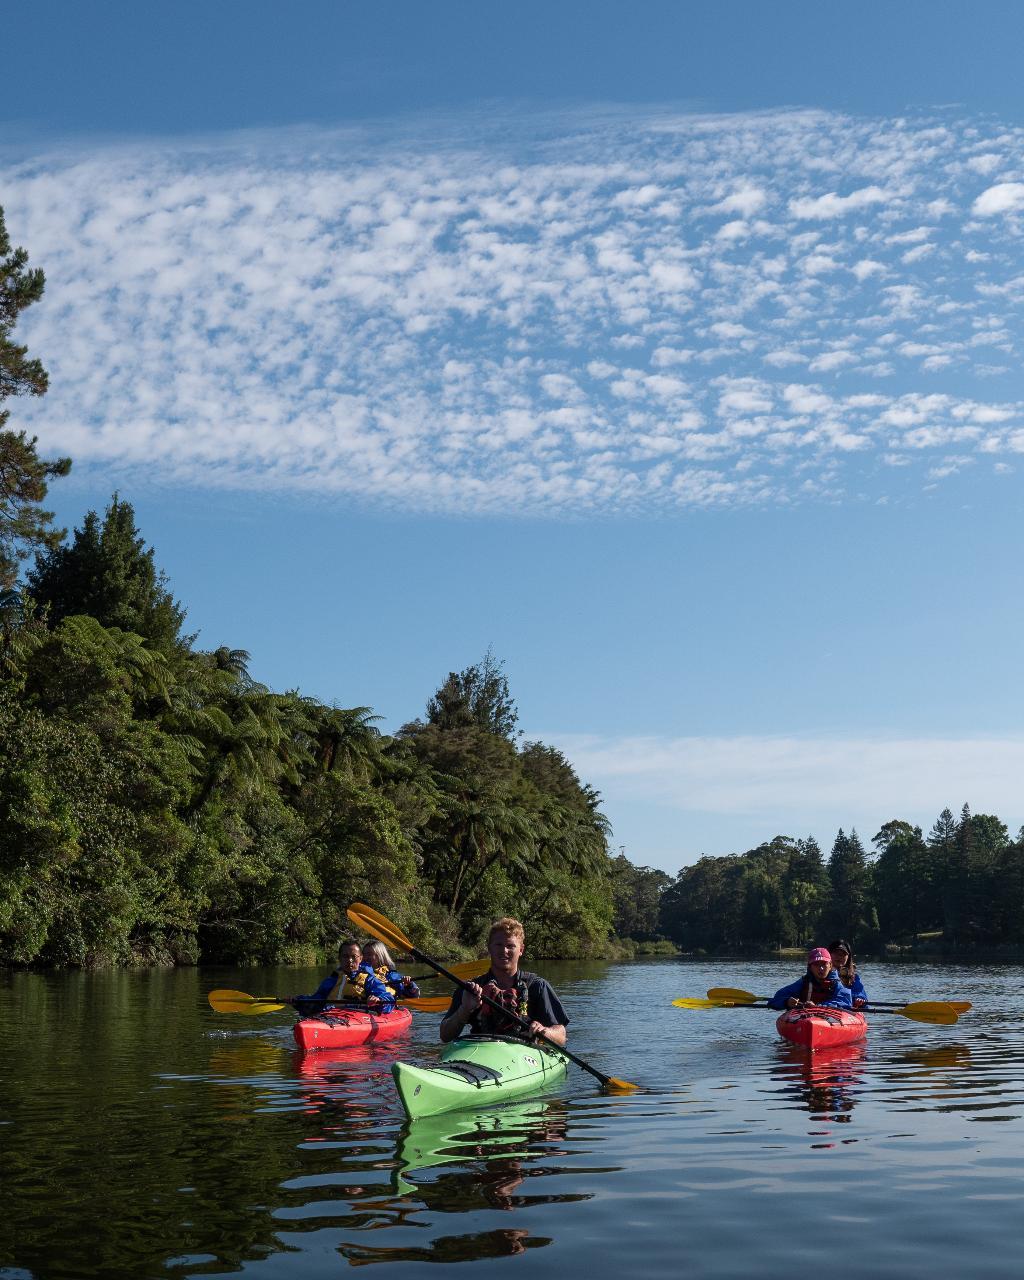 SHORE EXCURSION: Scenic Lake McLaren Kayak Tour